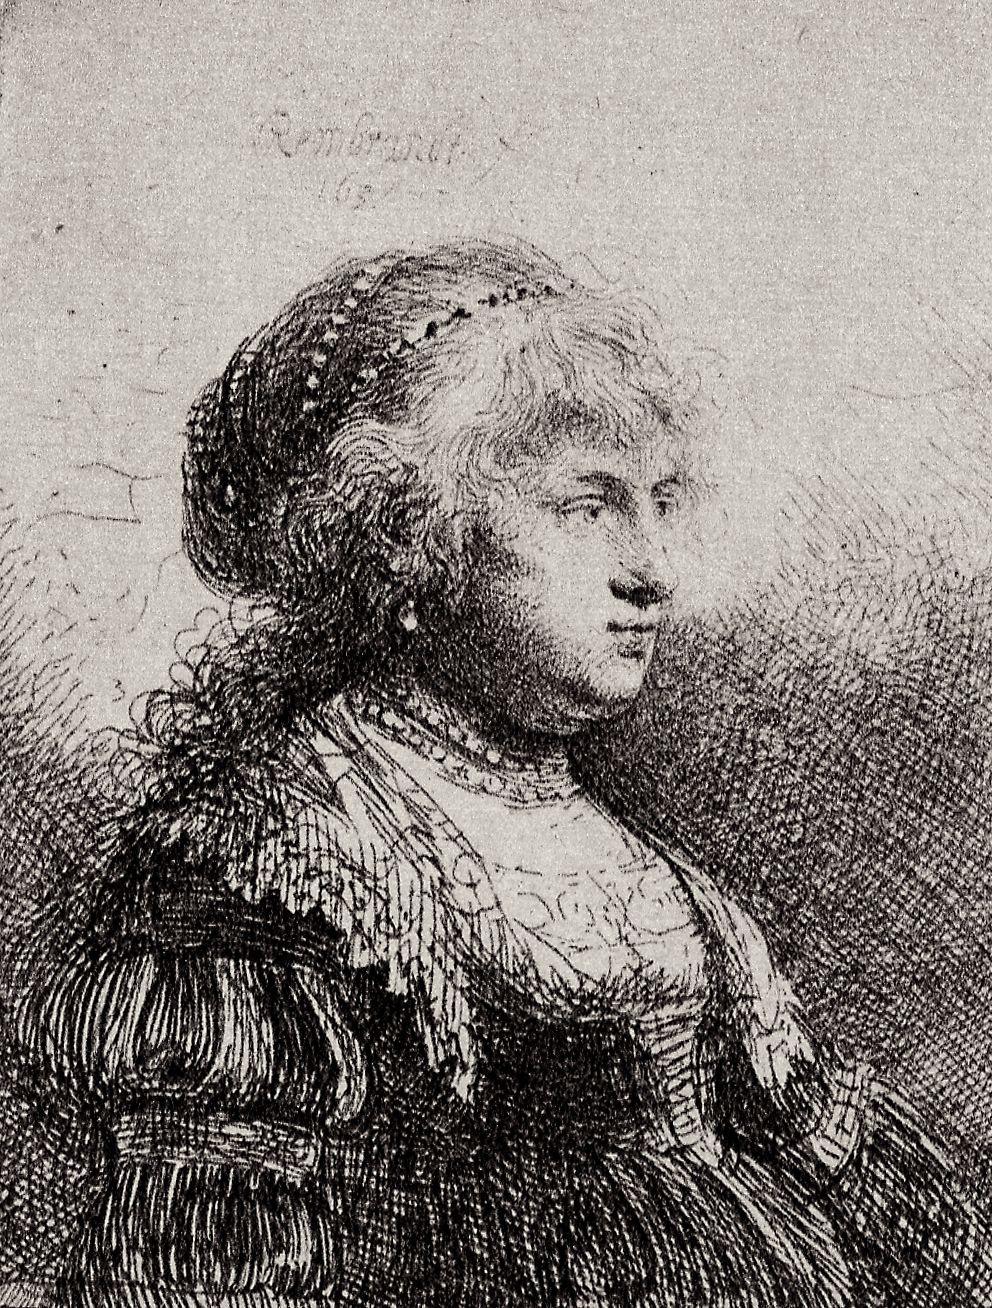 Rembrandt Harmenszoon van Rijn. Portrait of Saskia in fancy dress